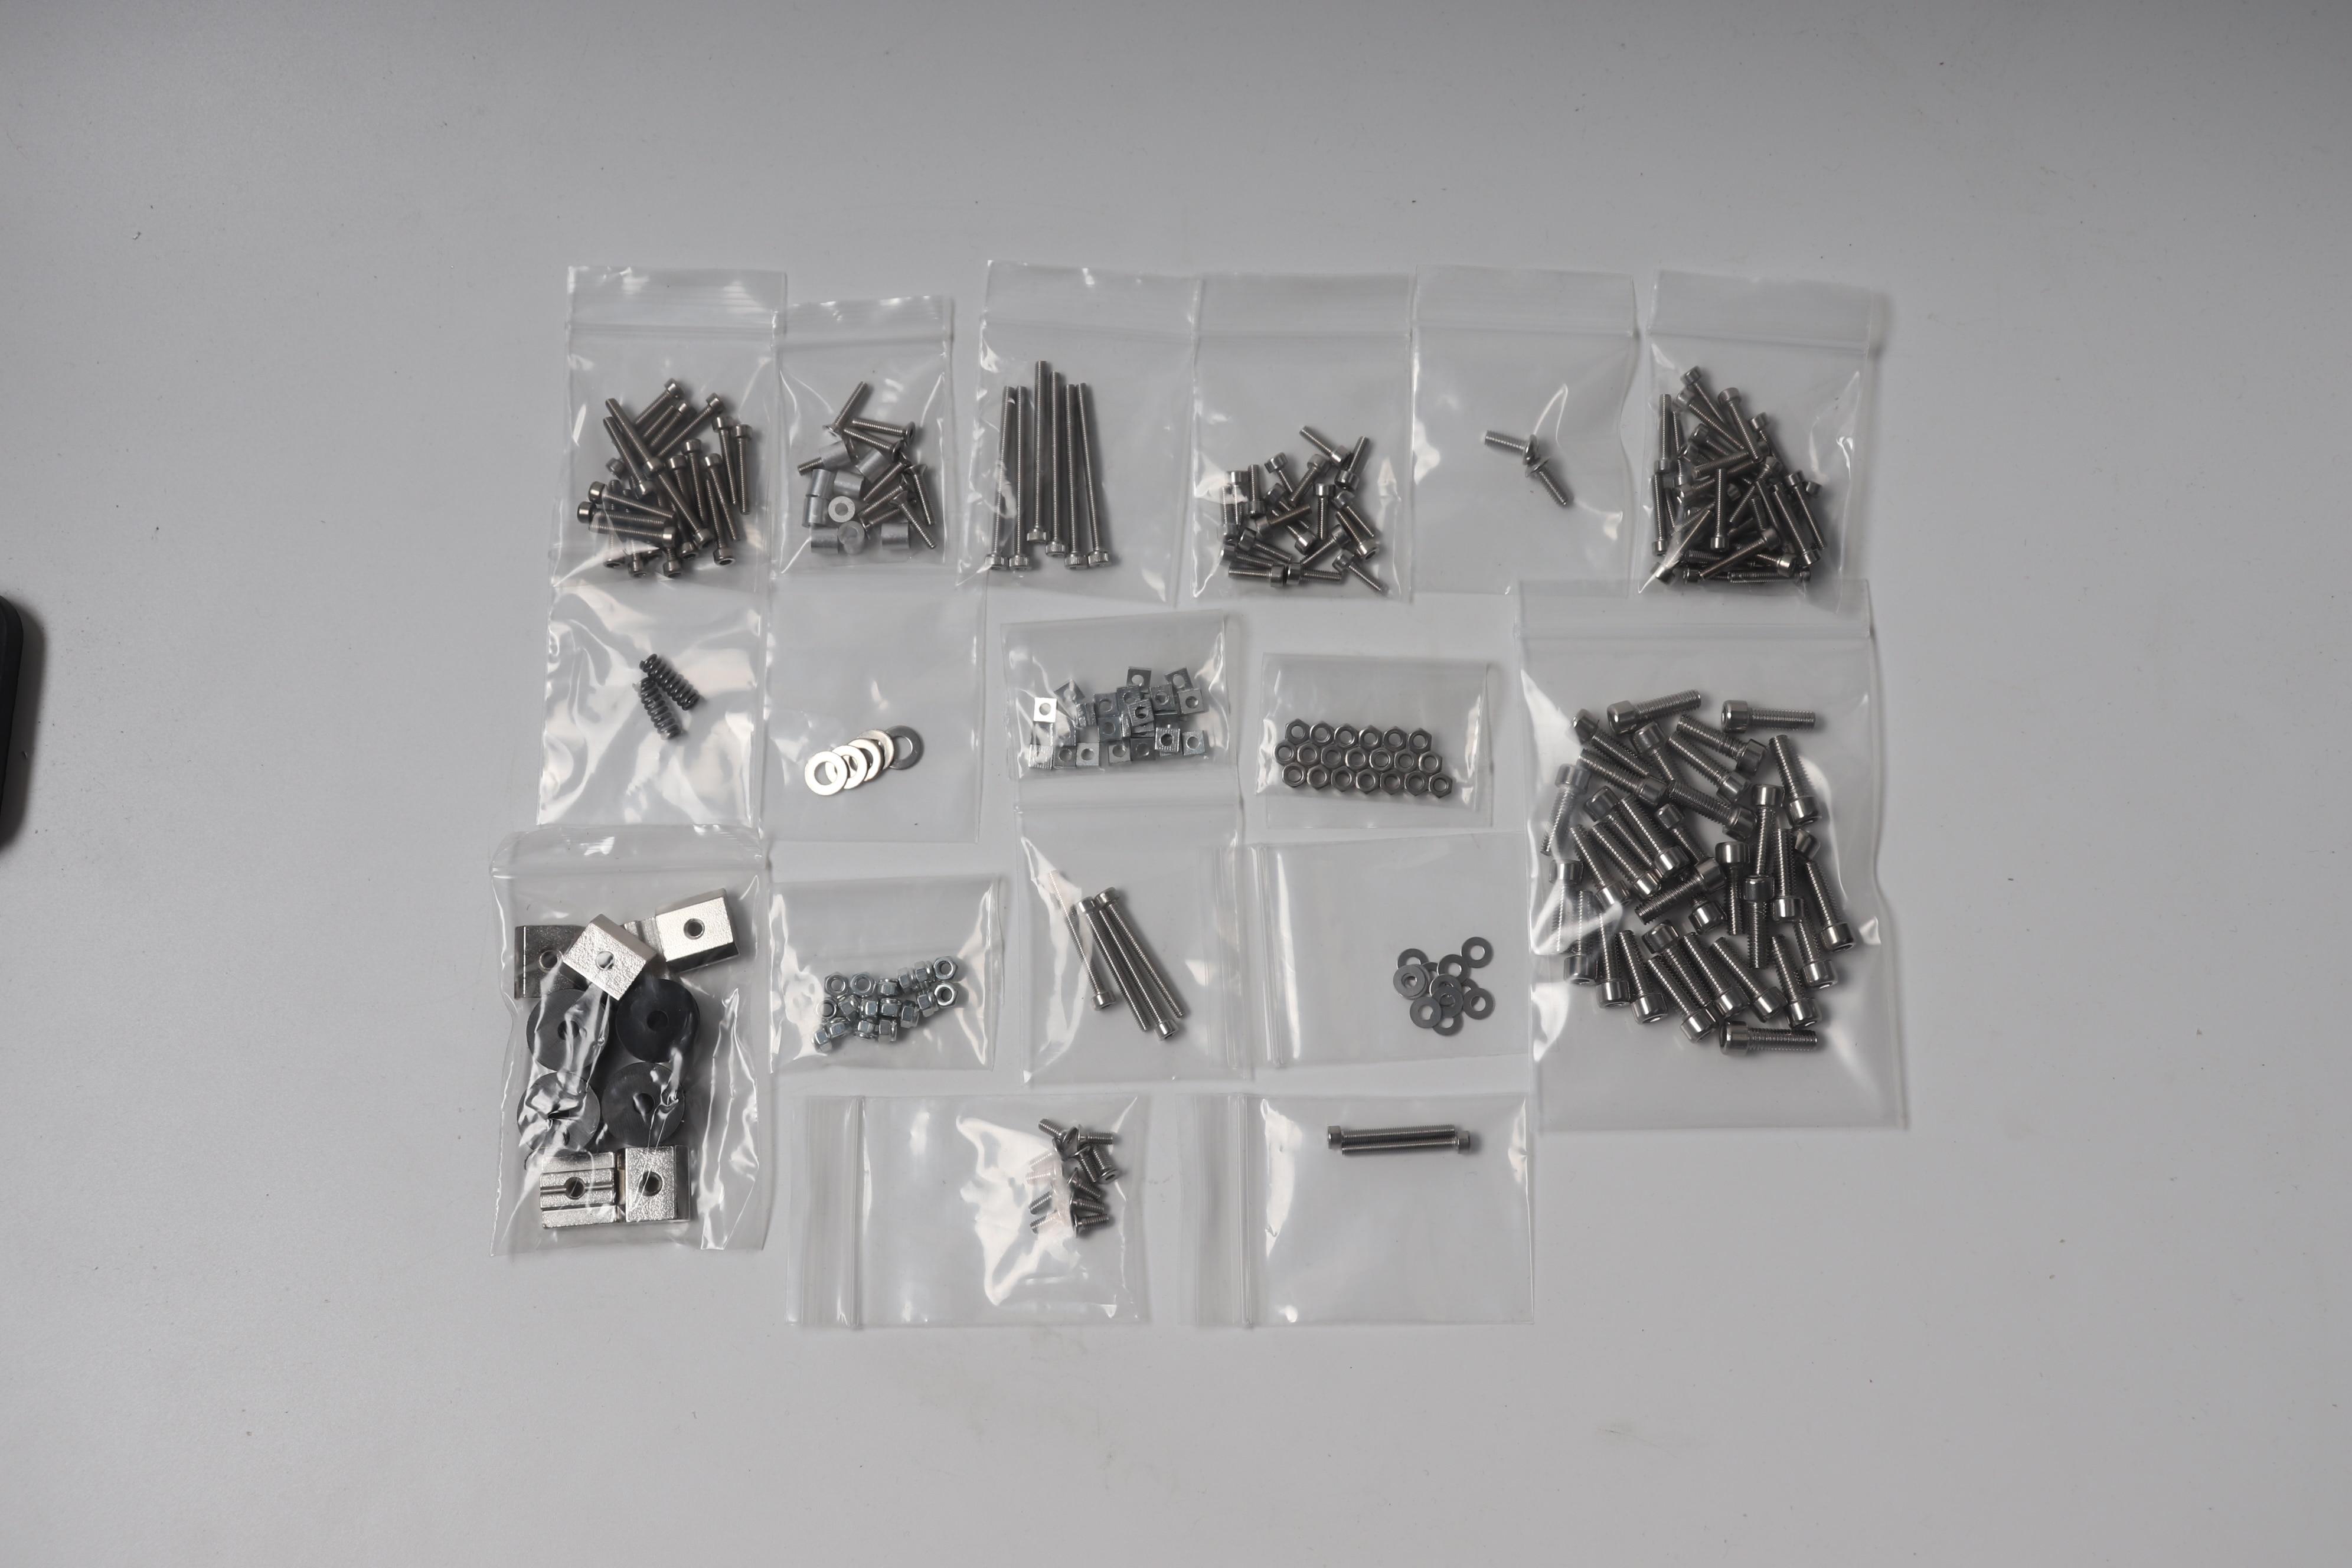 1.7 Thin Square Nut The Whole Kit PRUAS I3 MK3 Screw Nut Hardware Machine Parts For Prusa I3 MK3 3D Printer Parts Mk3 Screws Kit